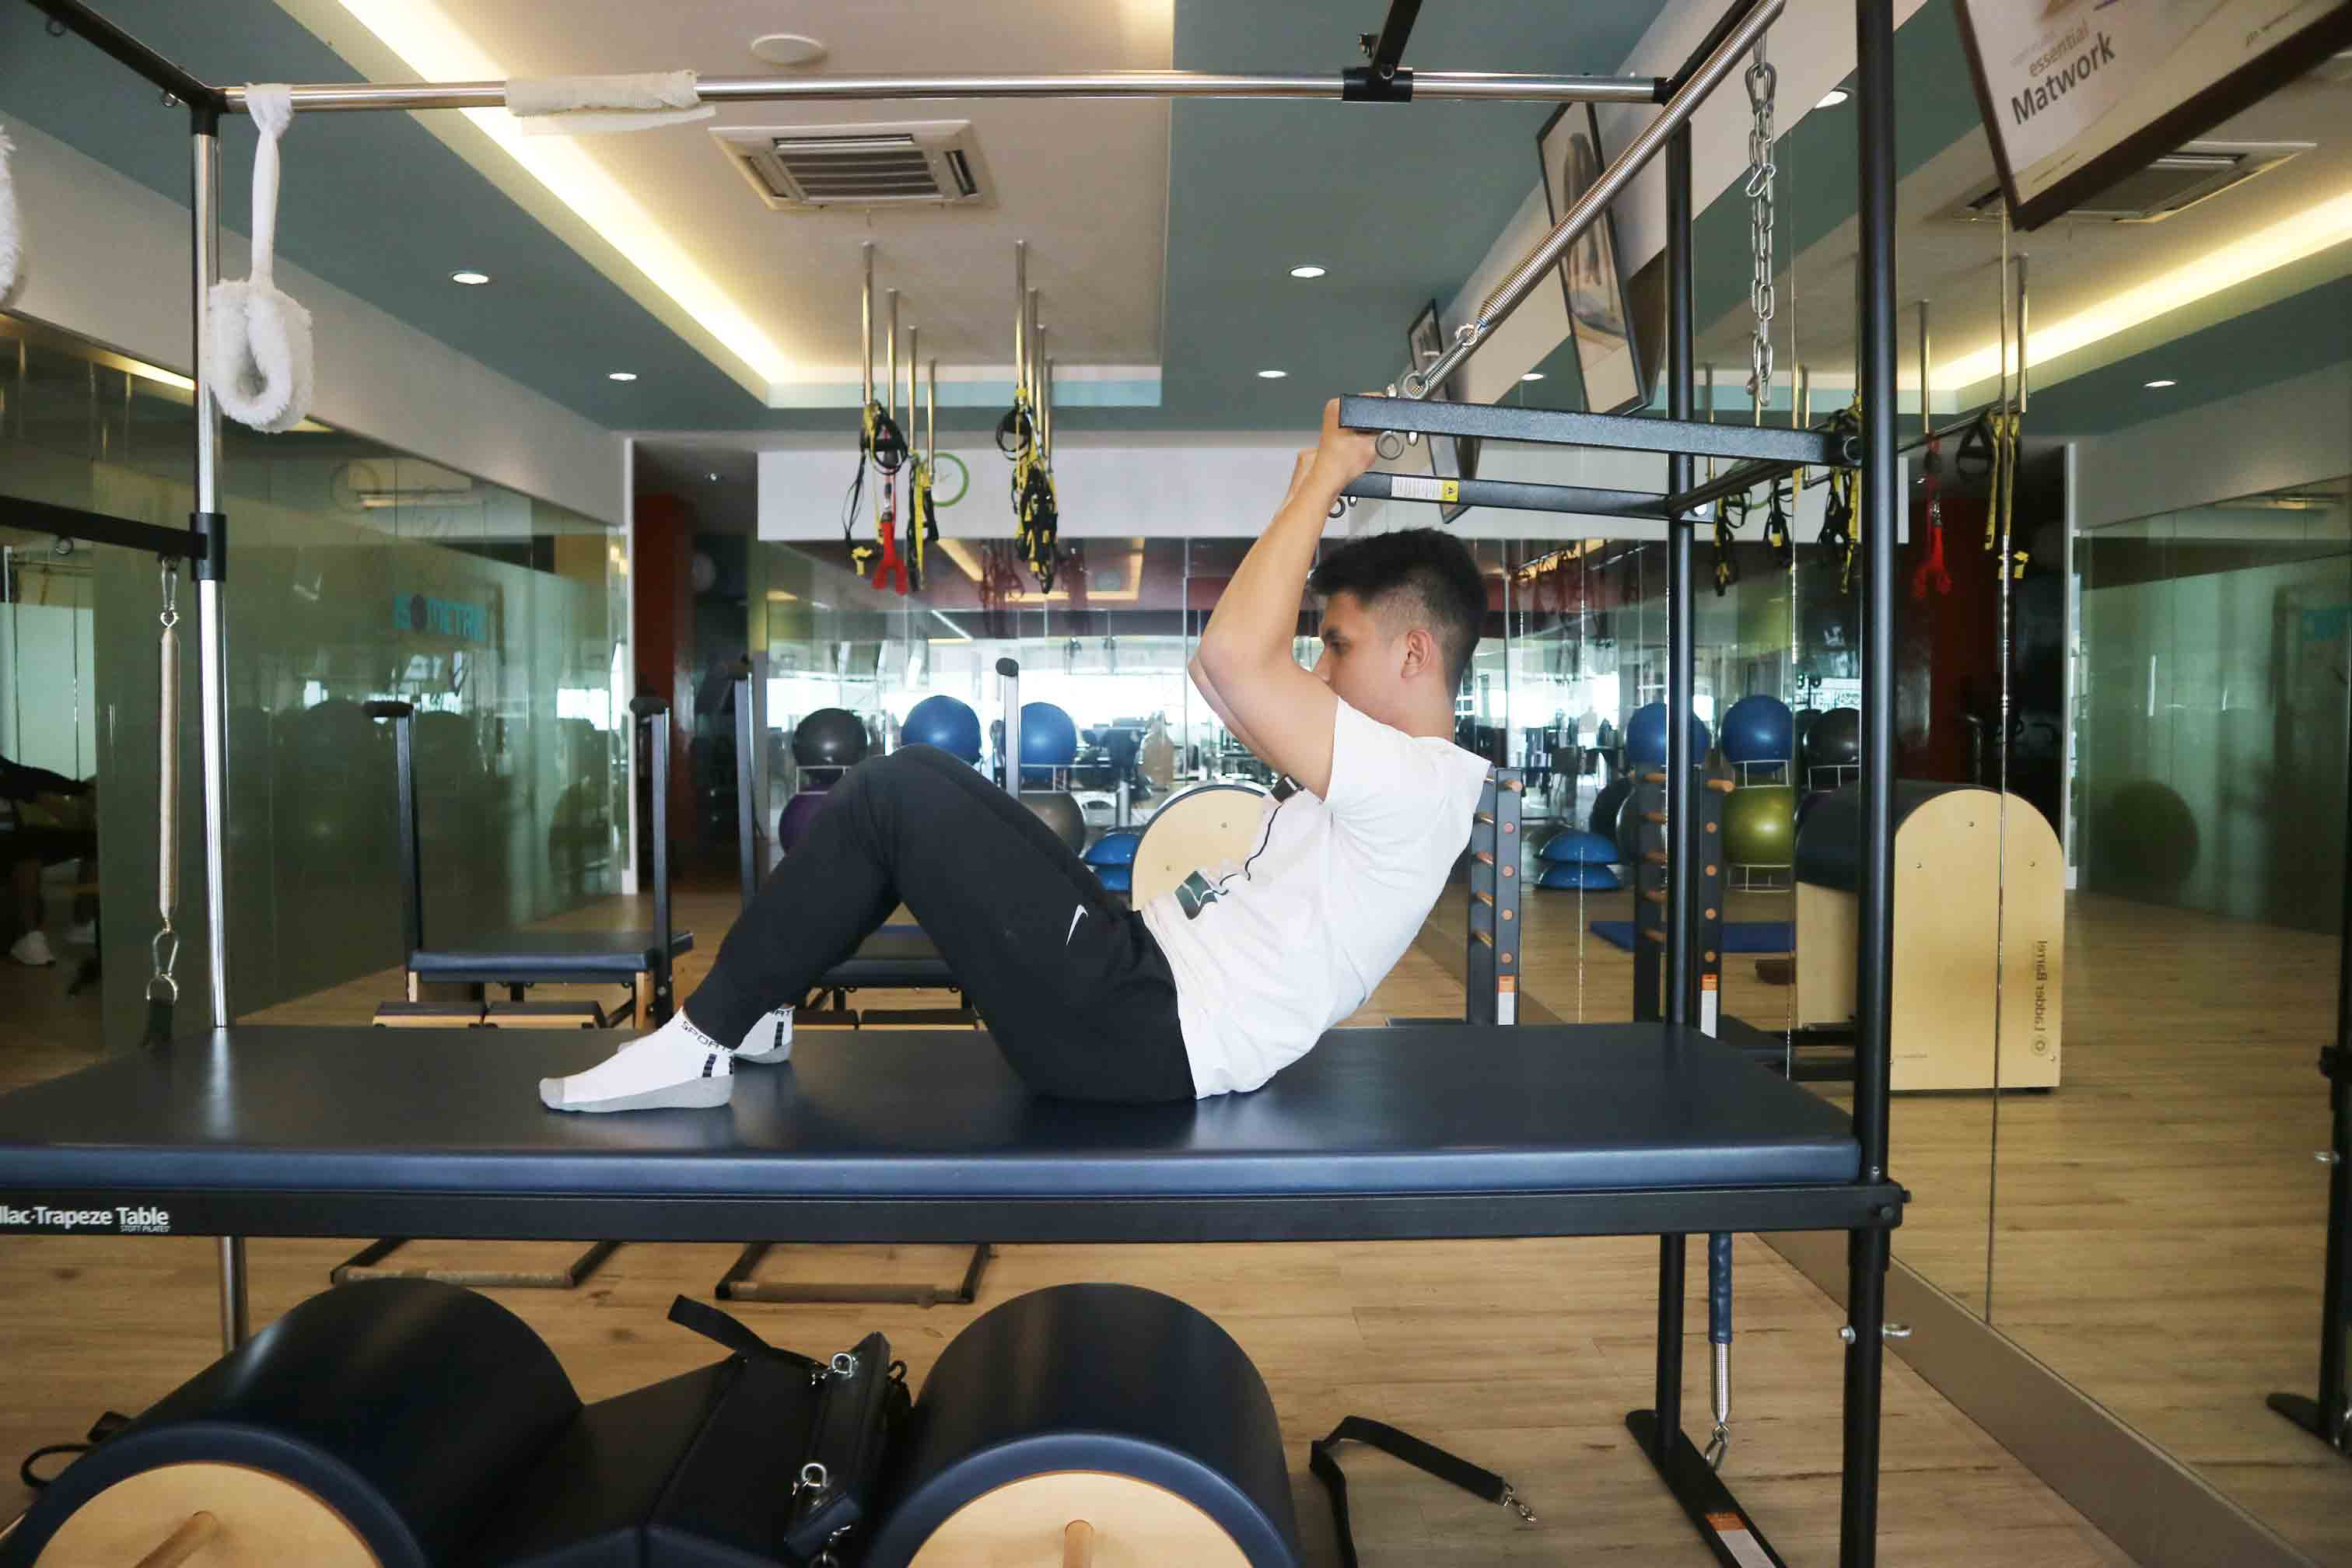 cadillac pilates equipment